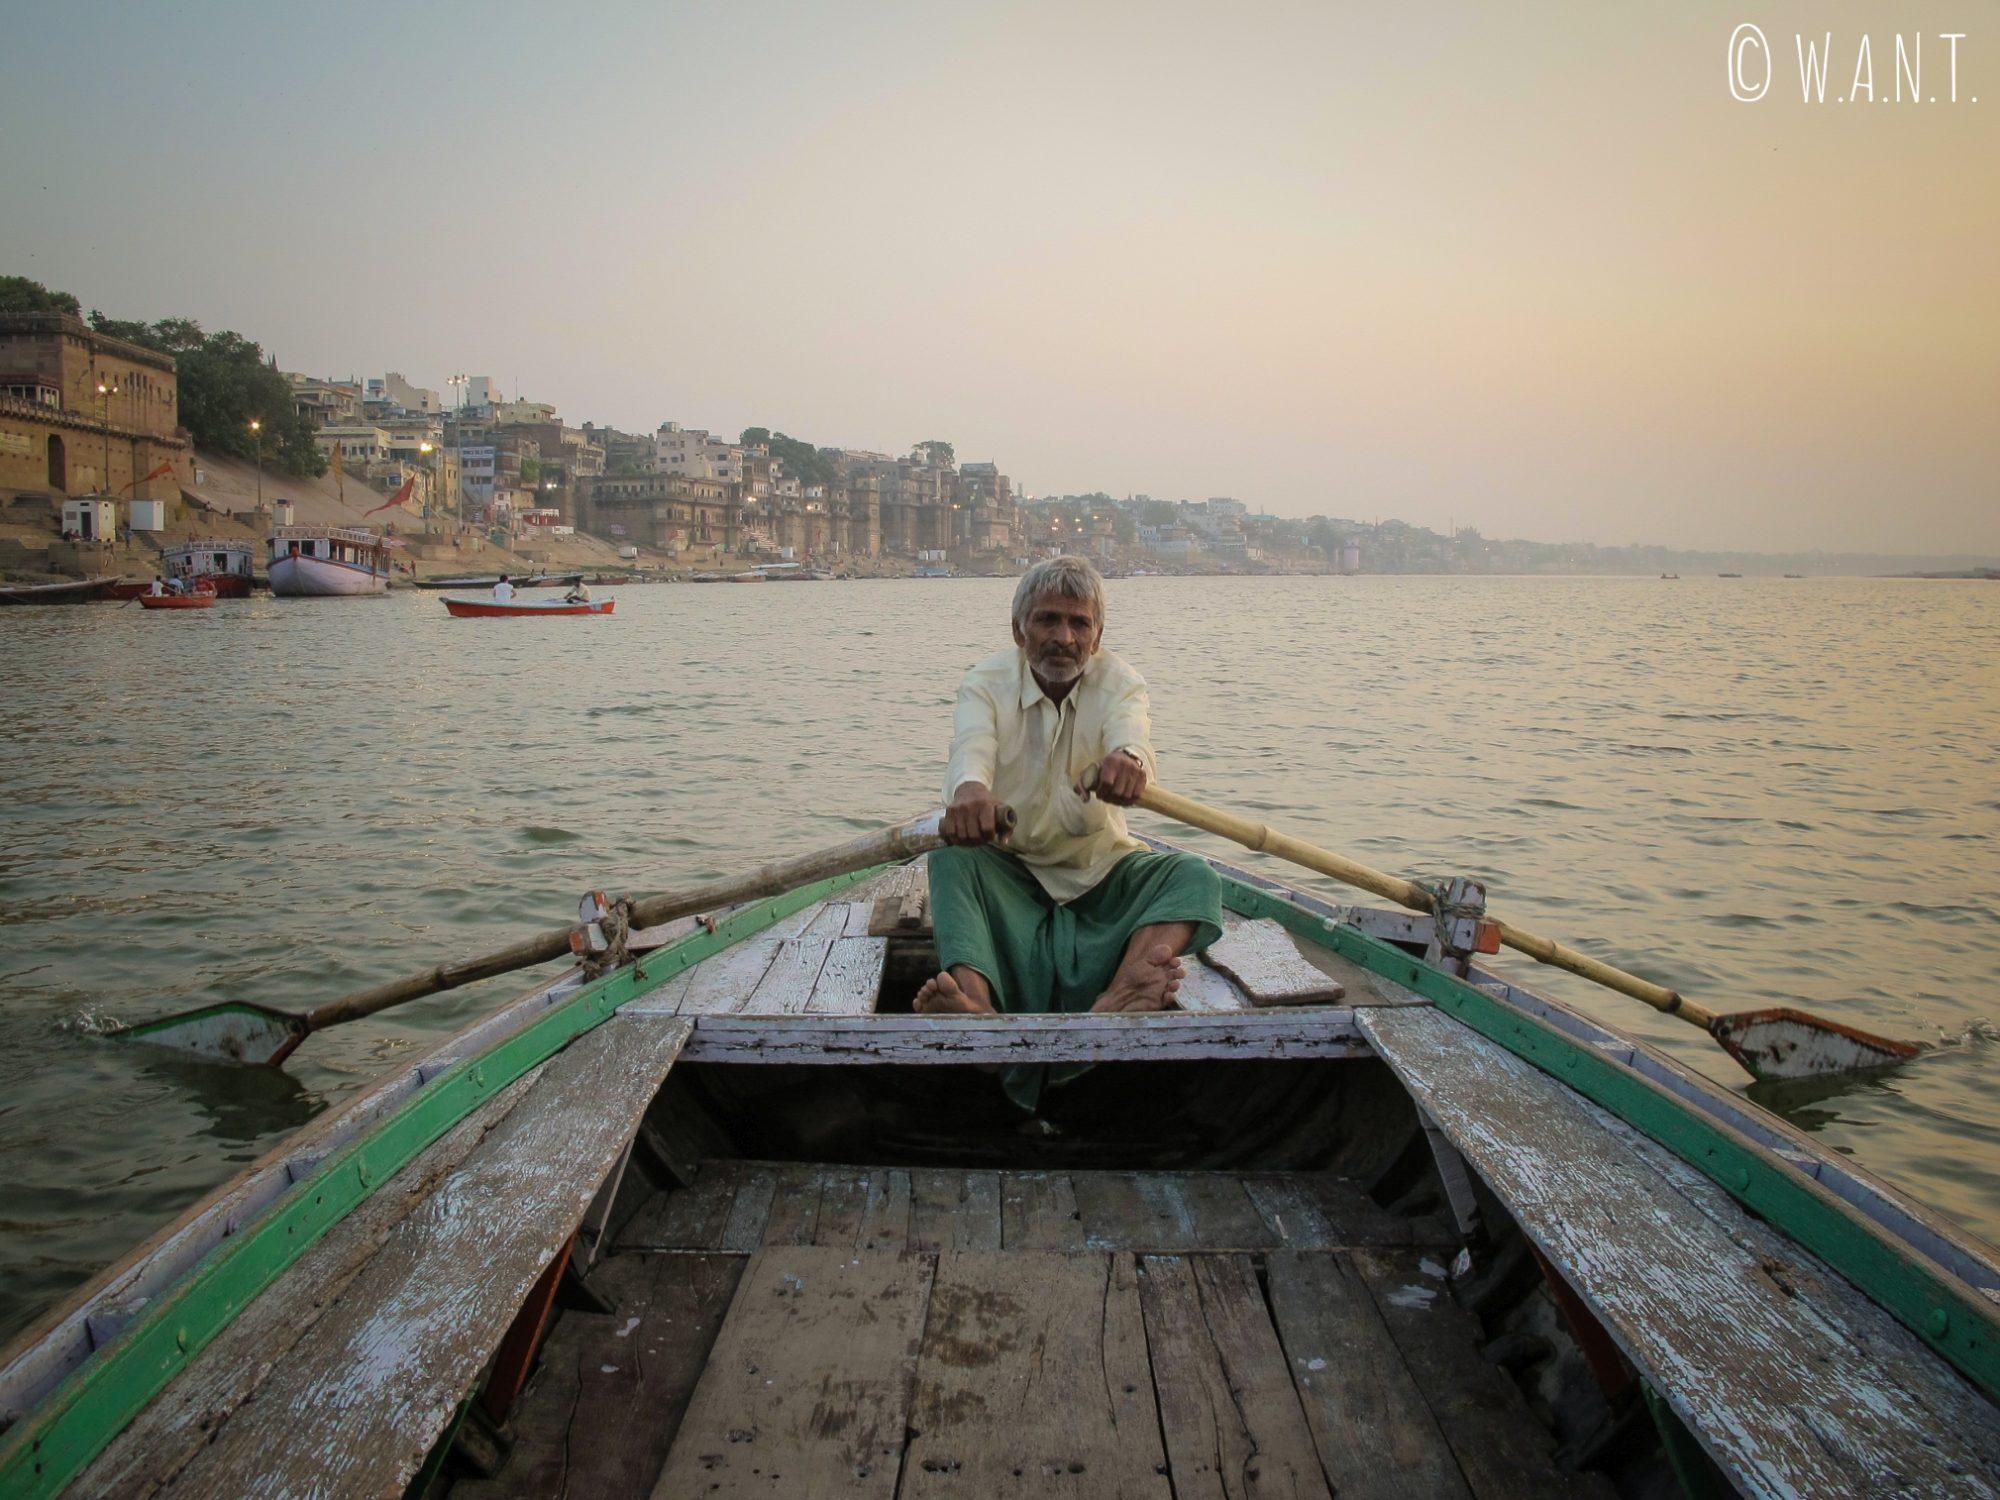 Le pilote de notre barque connaît les Ghats de Varanasi comme sa poche